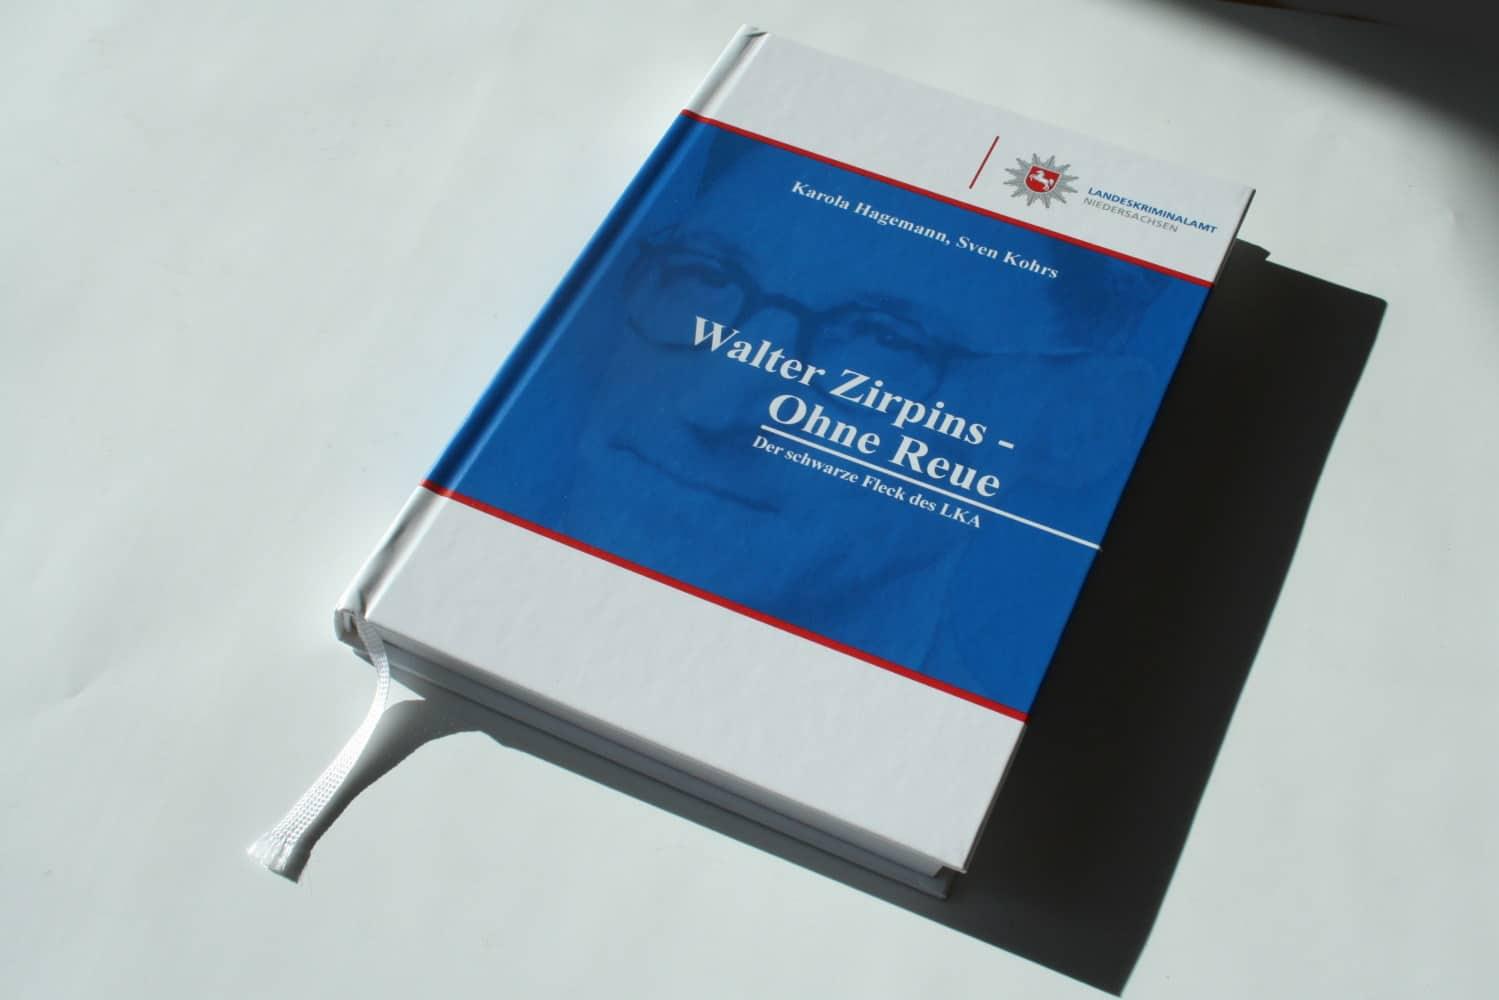 Karola Hagemann, Sven Kohrs: Walter Zirpins - Ohne Reue. Foto: Ralf Julke